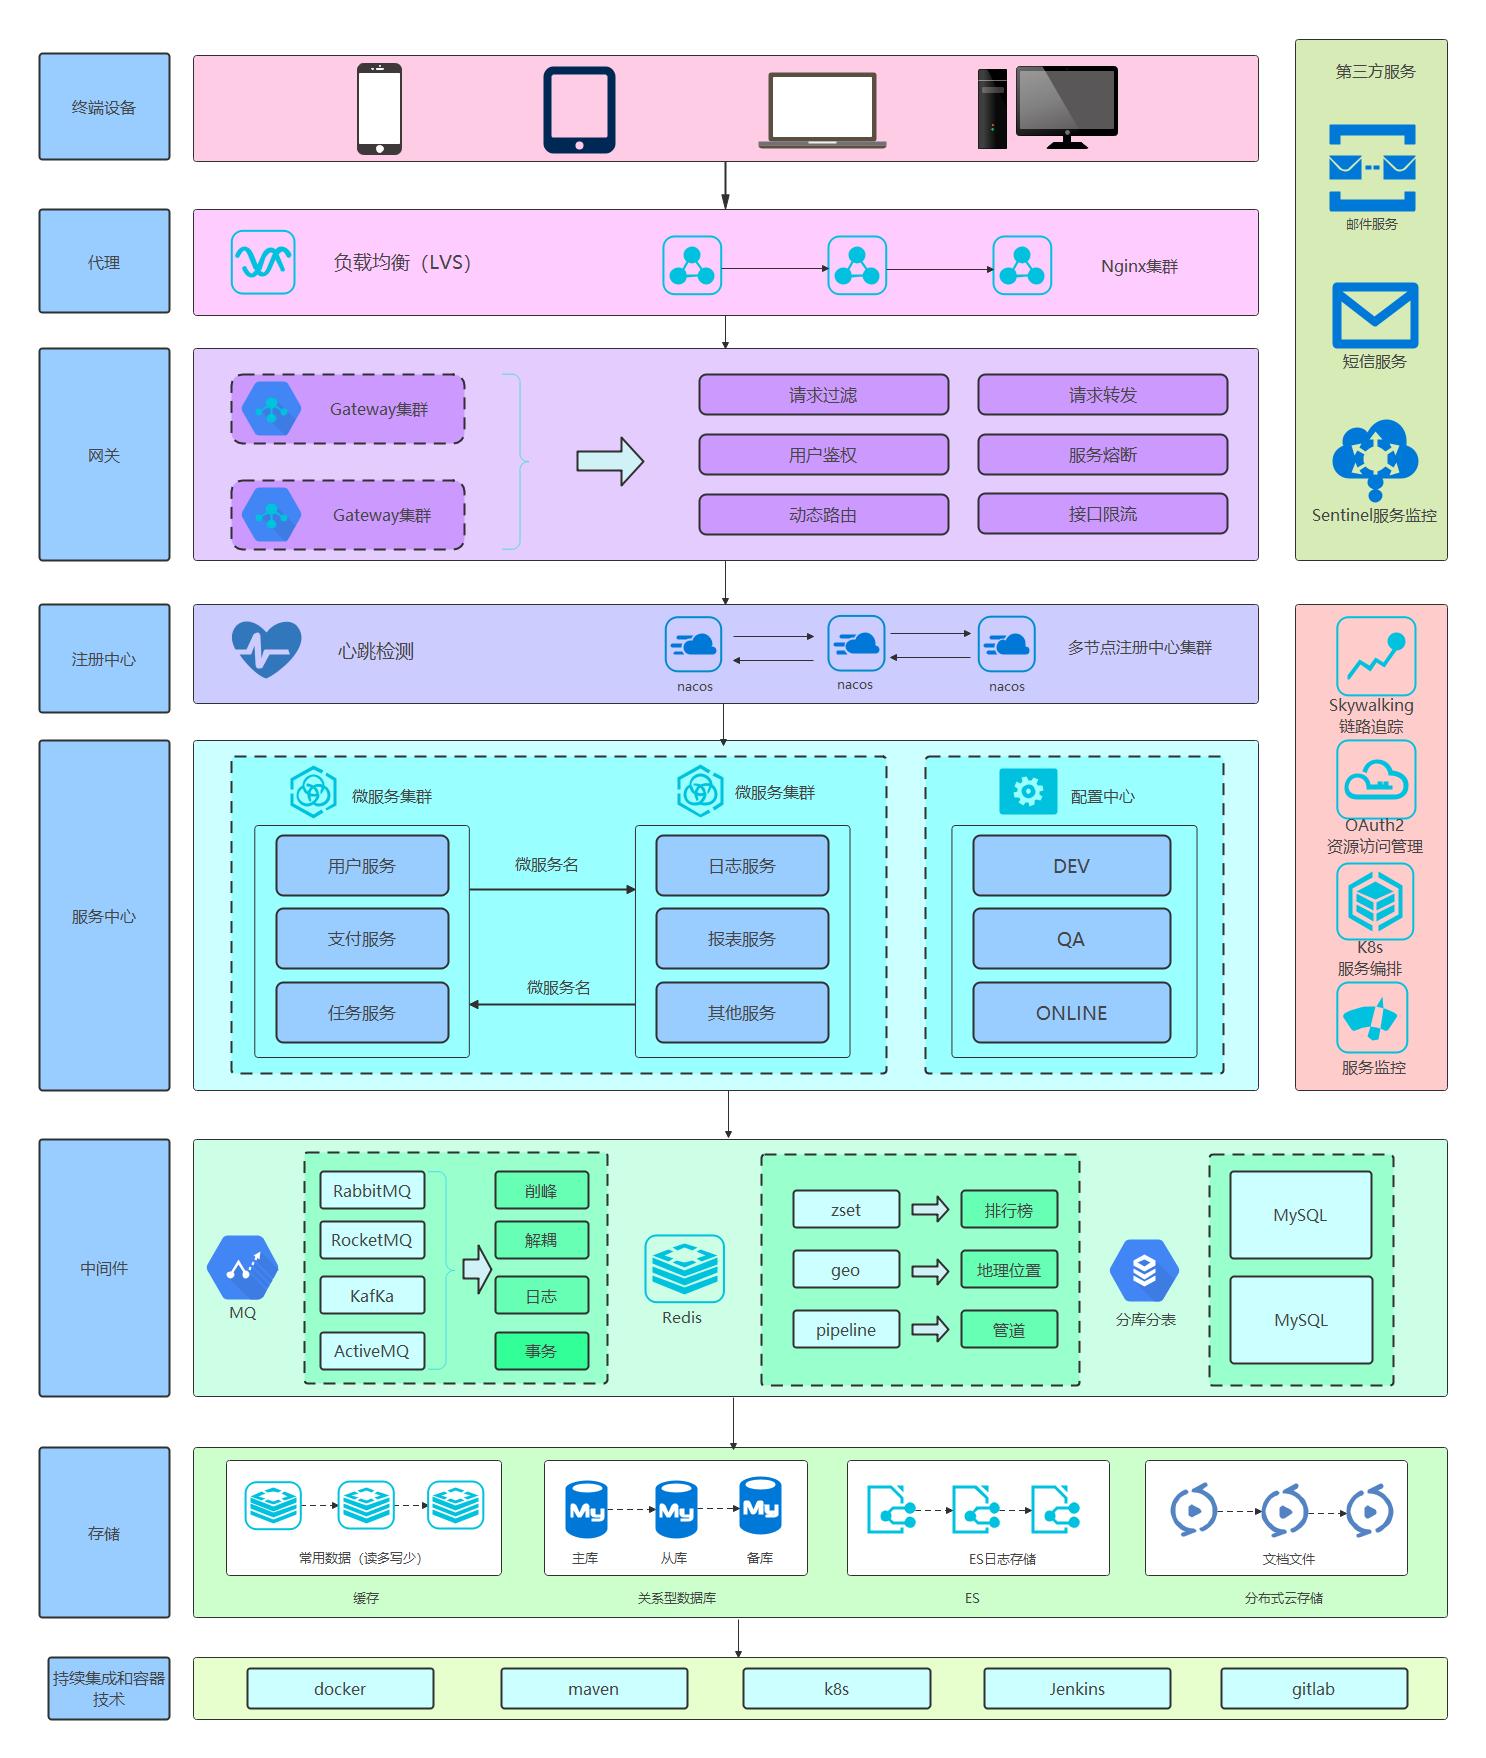 alibaba微服务架构图